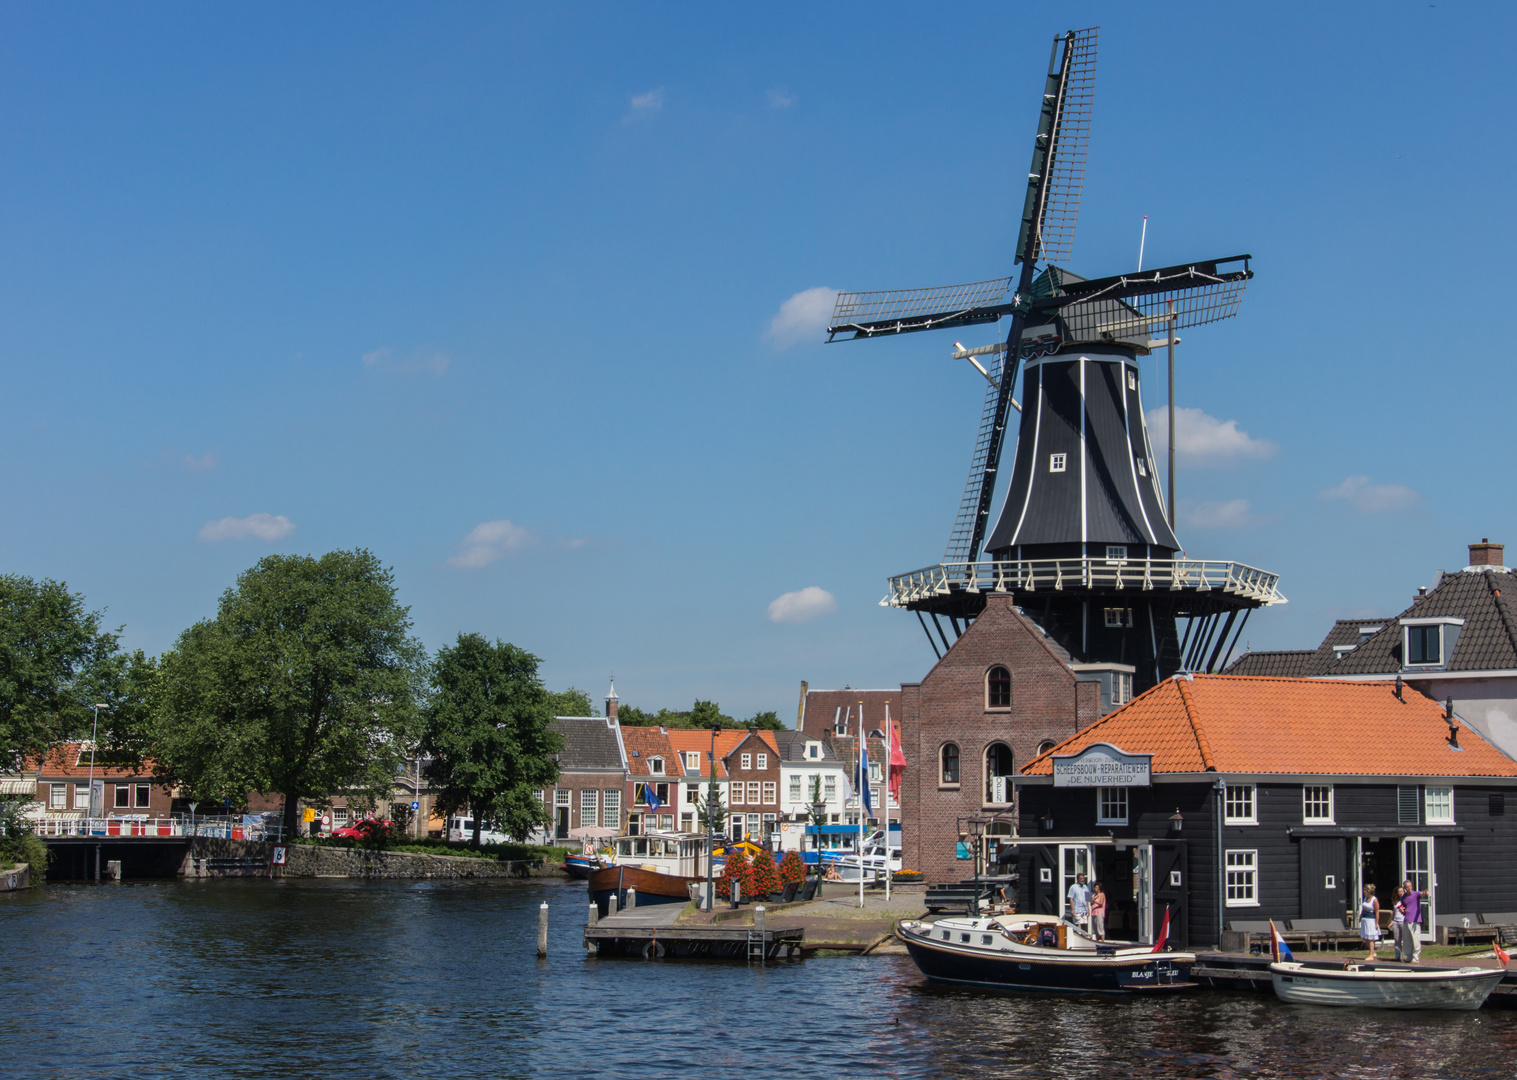 Grachtenansicht V - Haarlem/Niederlande